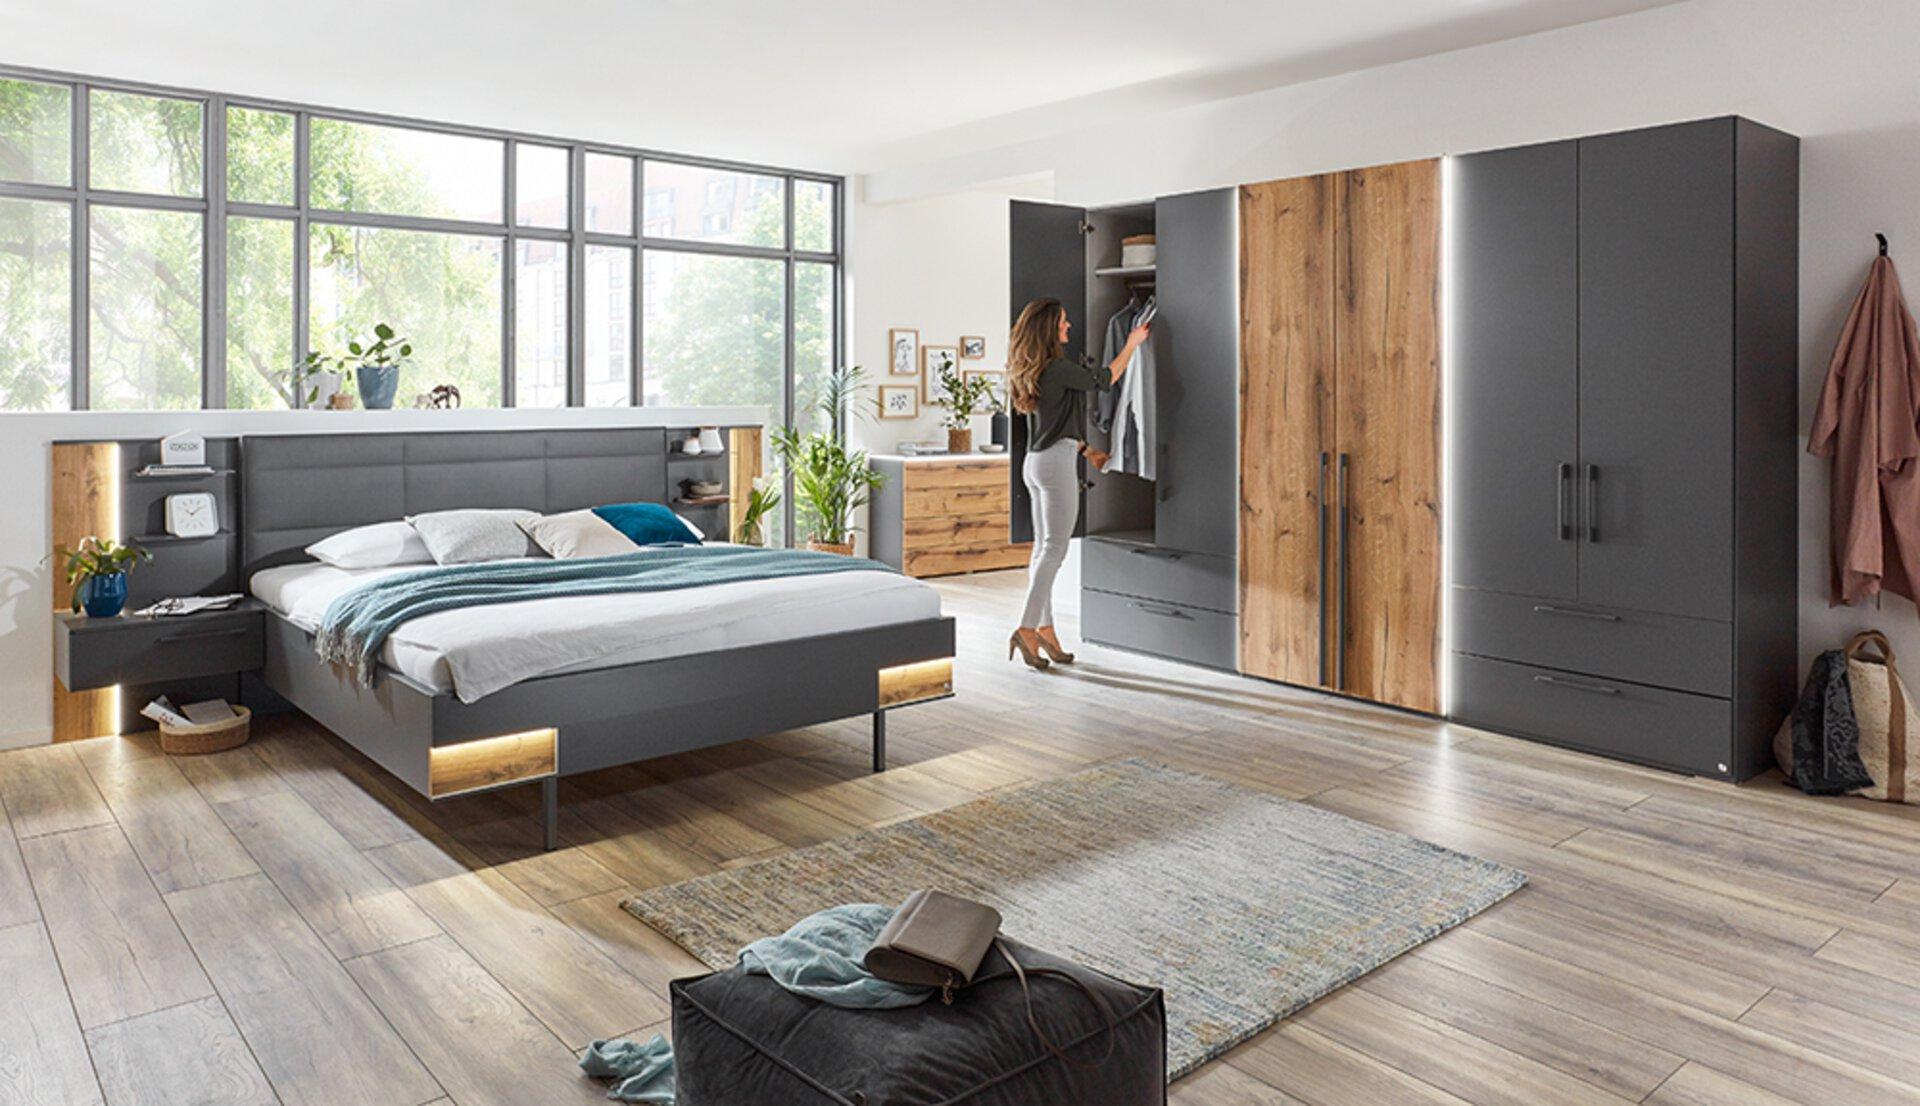 Schlafzimmer VIDANO MONDO Holzwerkstoff 216 x 112 x 187 cm